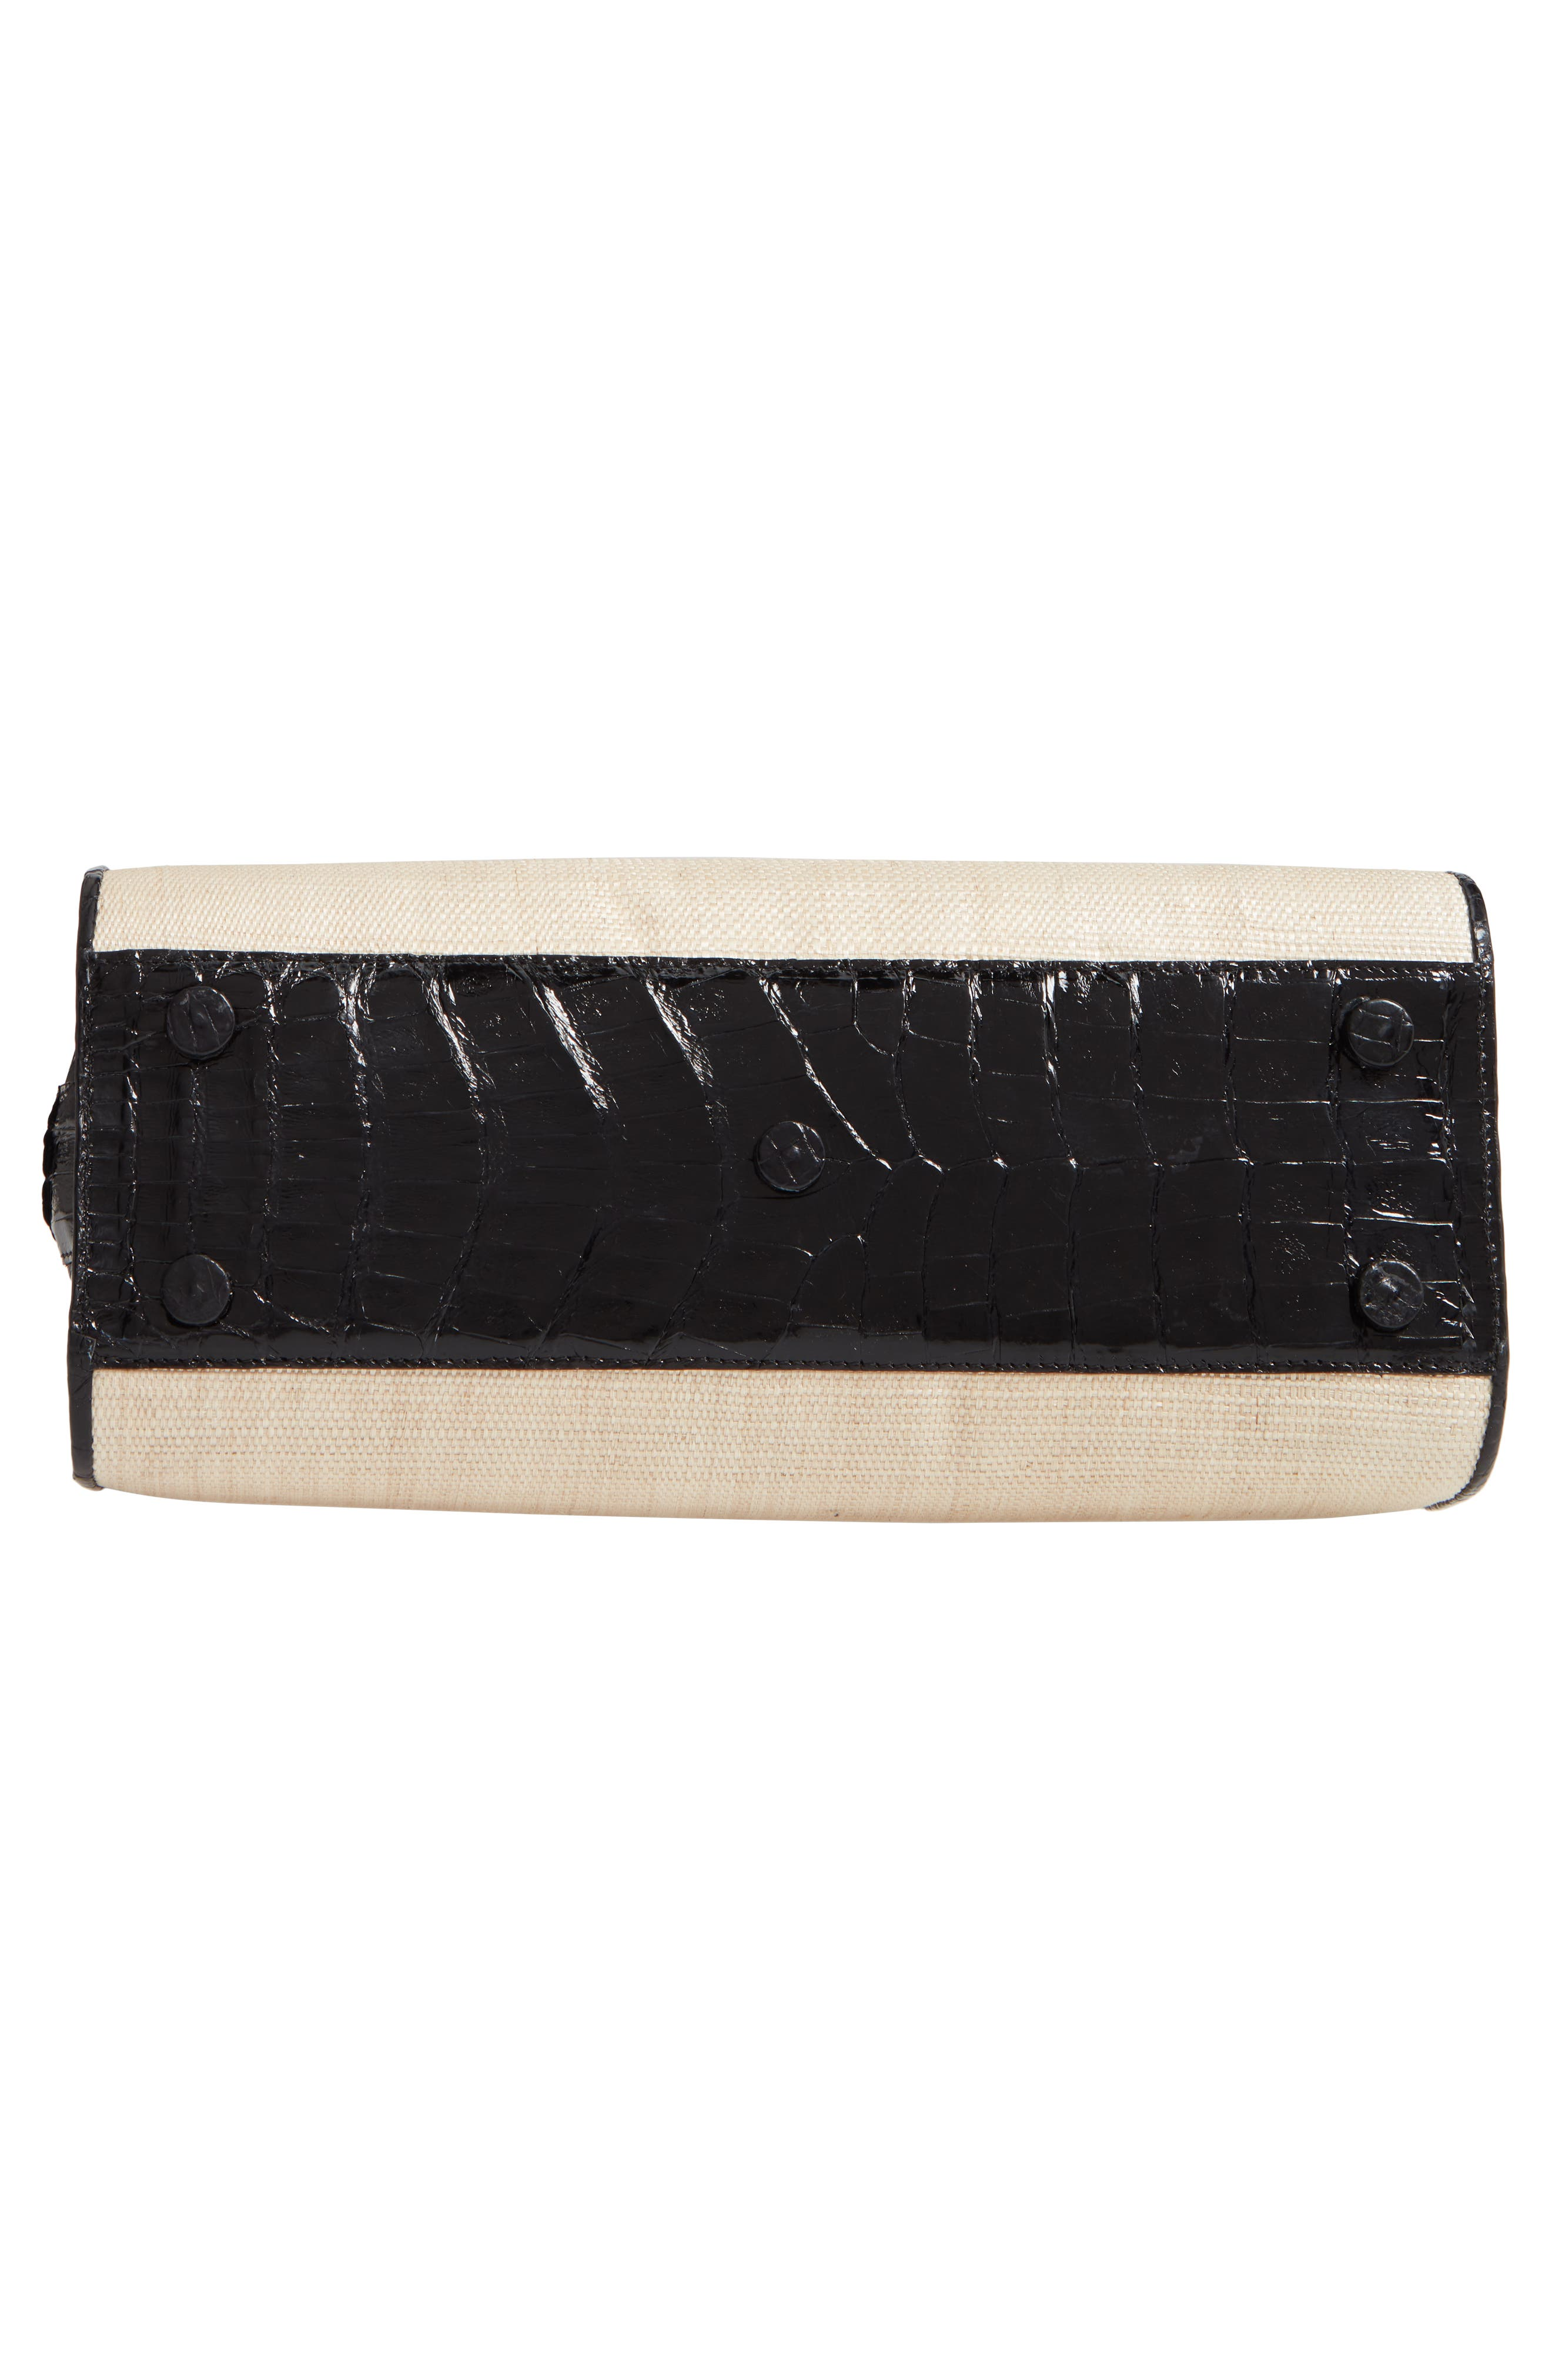 Small Genuine Crocodile Top Handle Bag,                             Alternate thumbnail 6, color,                             BLACK/ STRAW